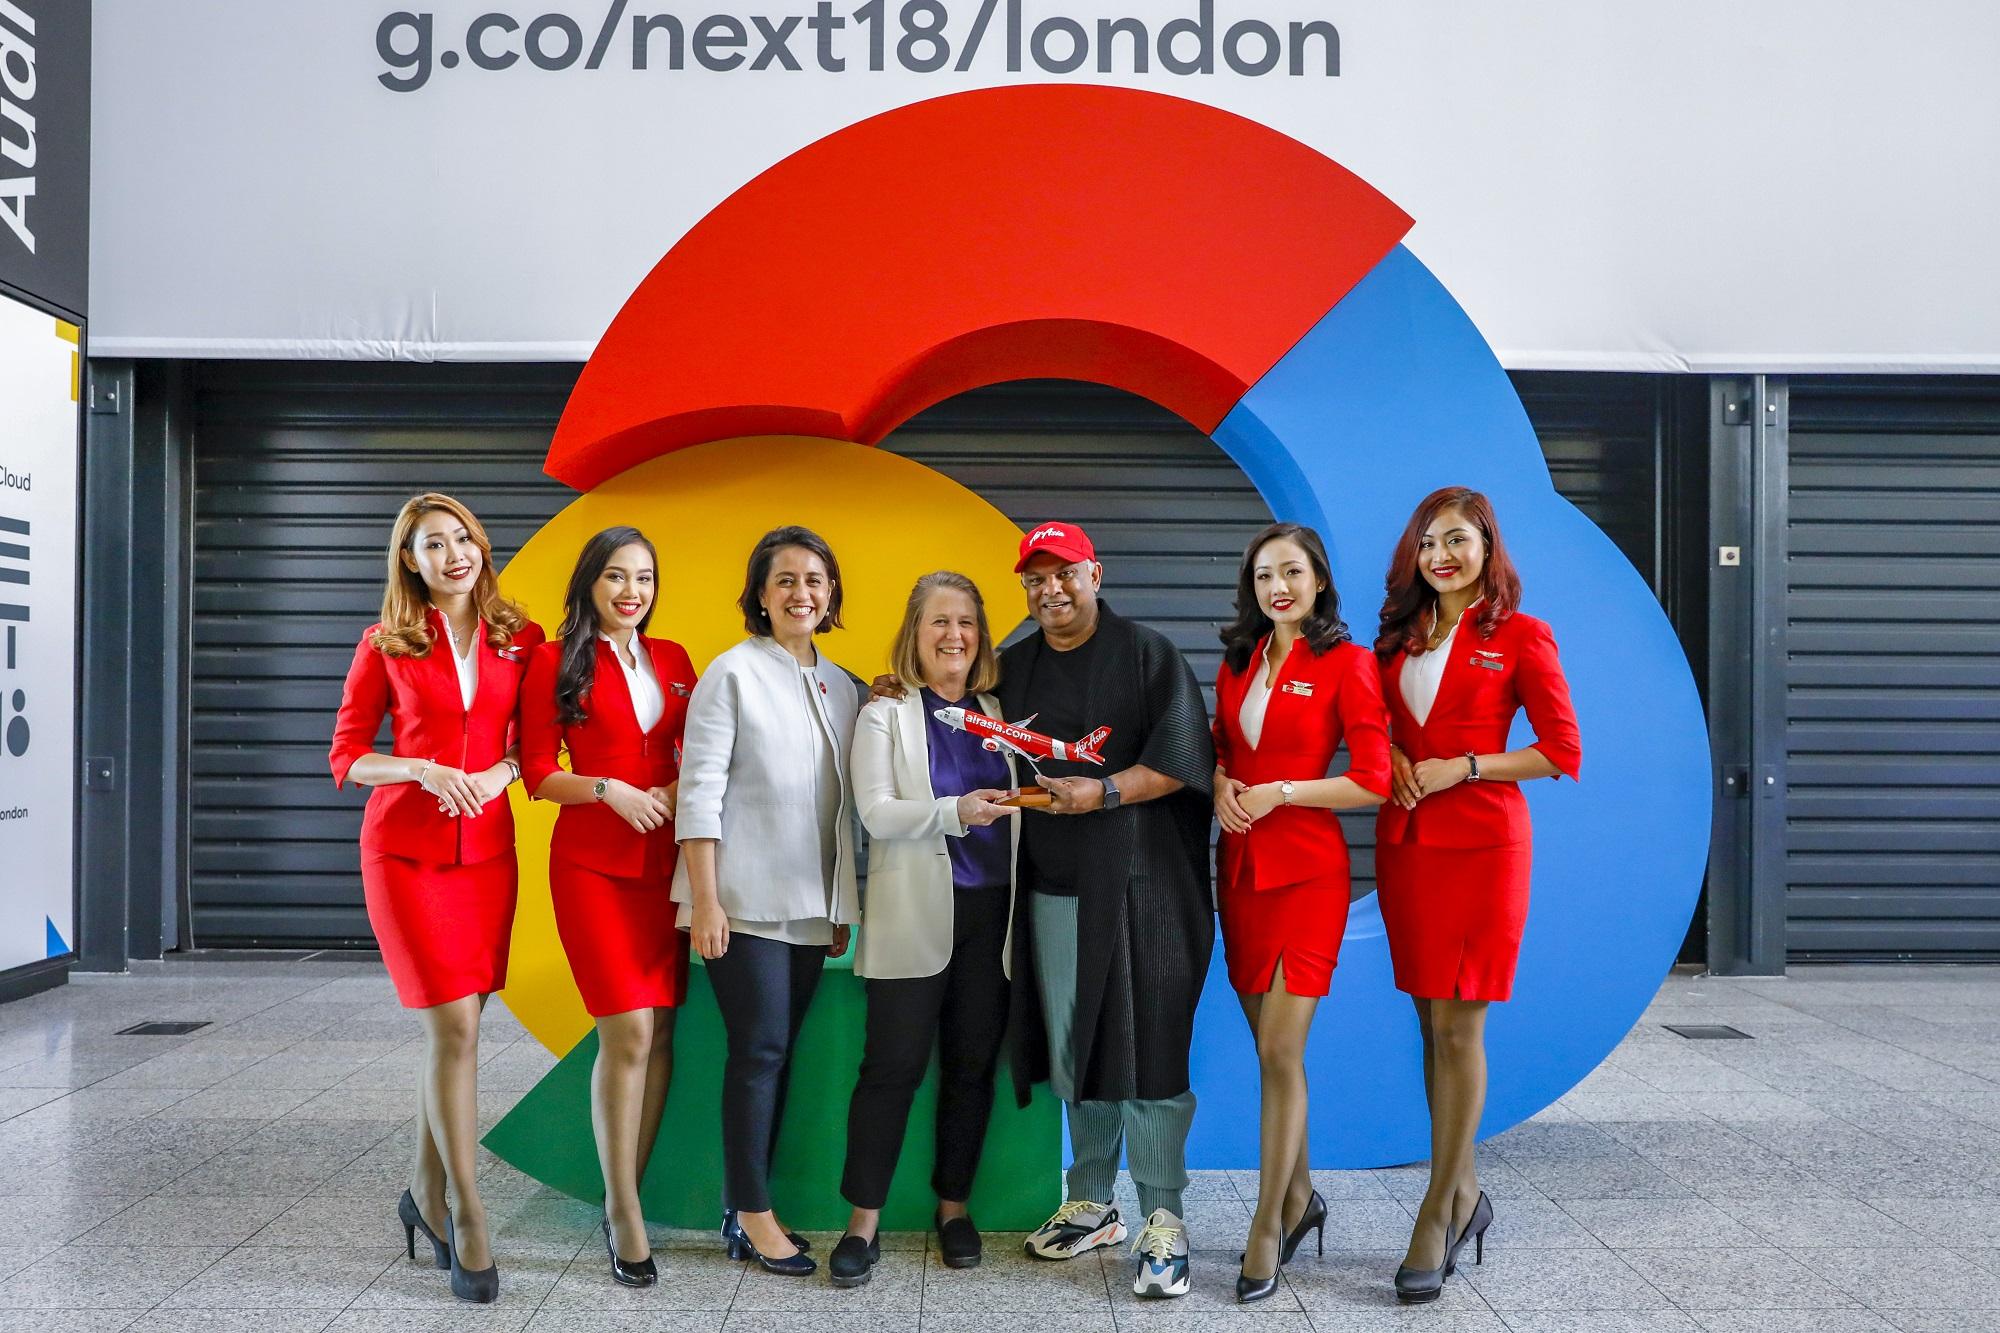 Google Cloud CEO Diane Green (giữa), AirAsia Group CEO Tony Fernandes và AirAsia Deputy Group CEO (Digital, Transformation and Corporate Services) Aireen Omar tại sự kiện Google Cloud NEXT '18 ở Luân Đôn.